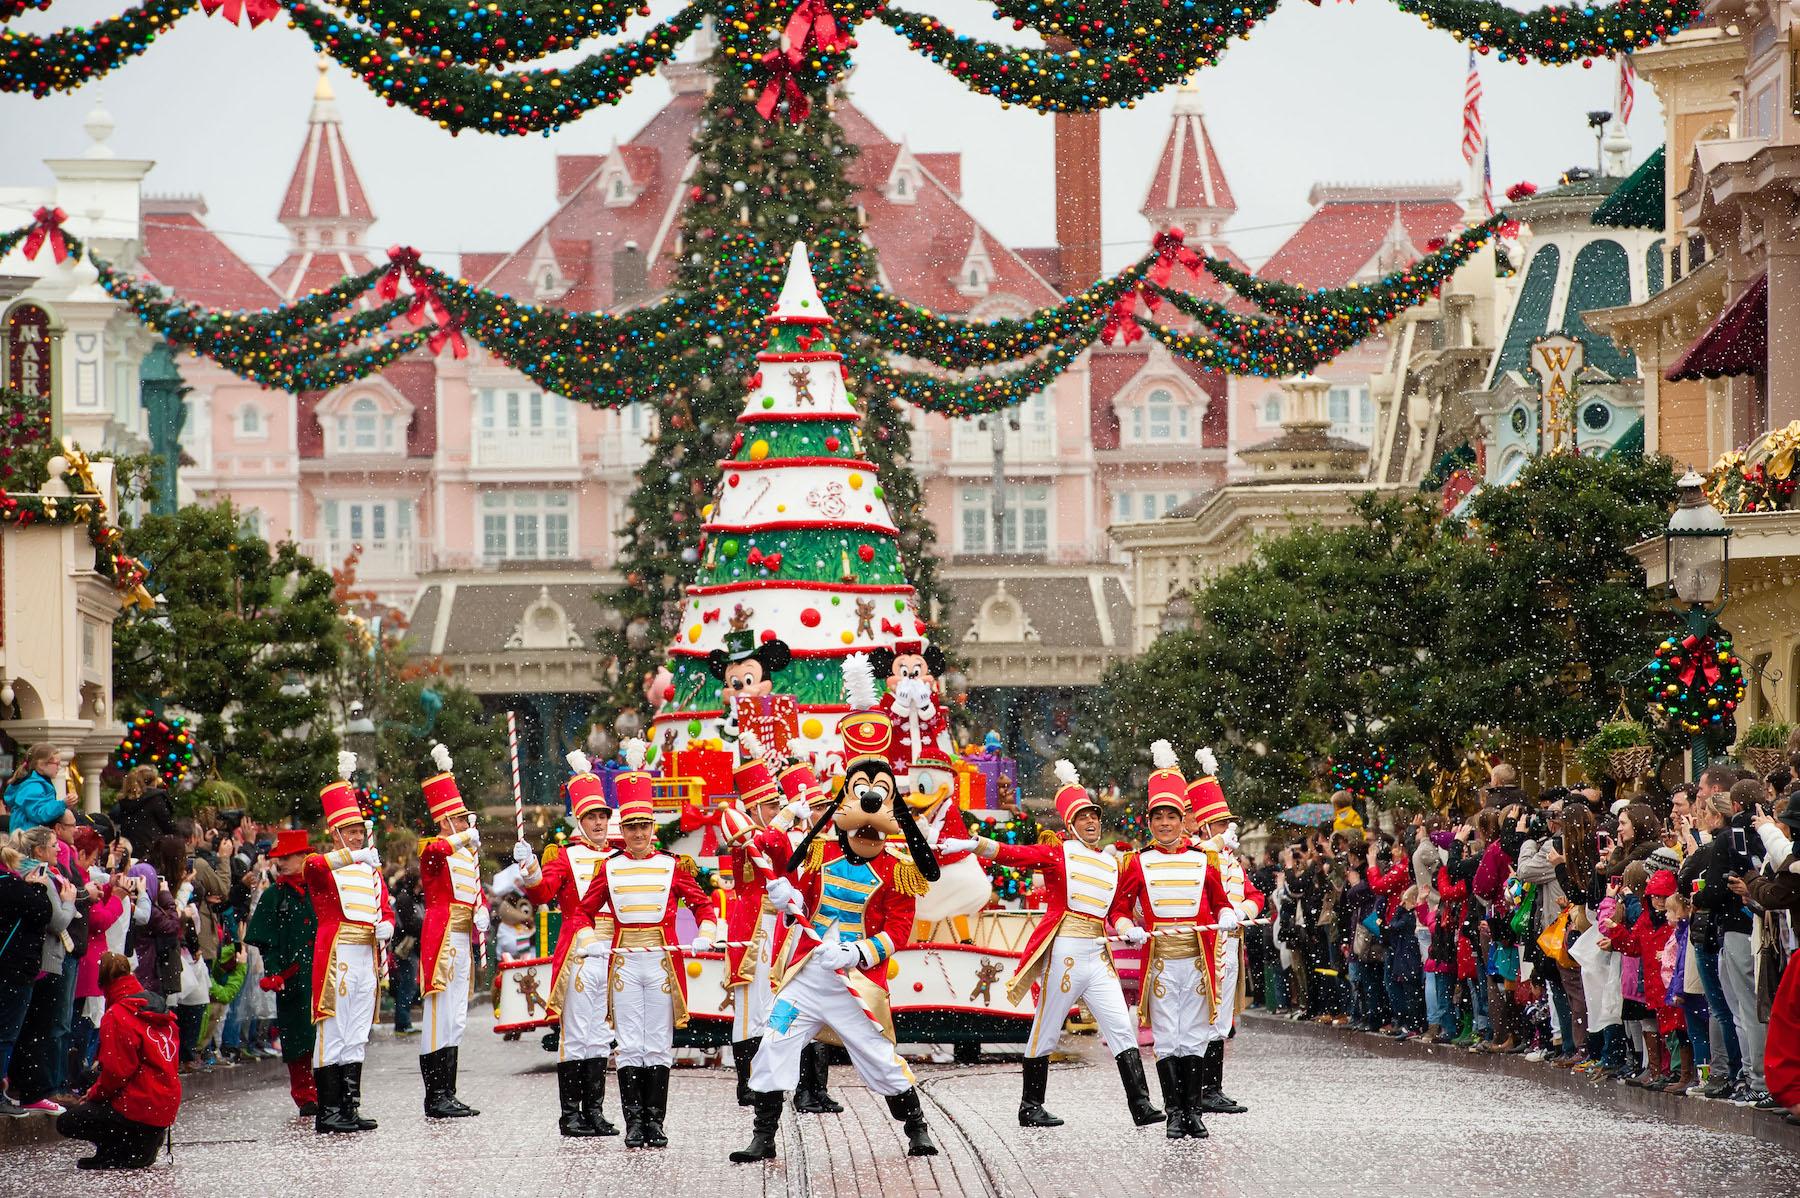 Cavalcade-Noel-Disneyland-Intro.jpg